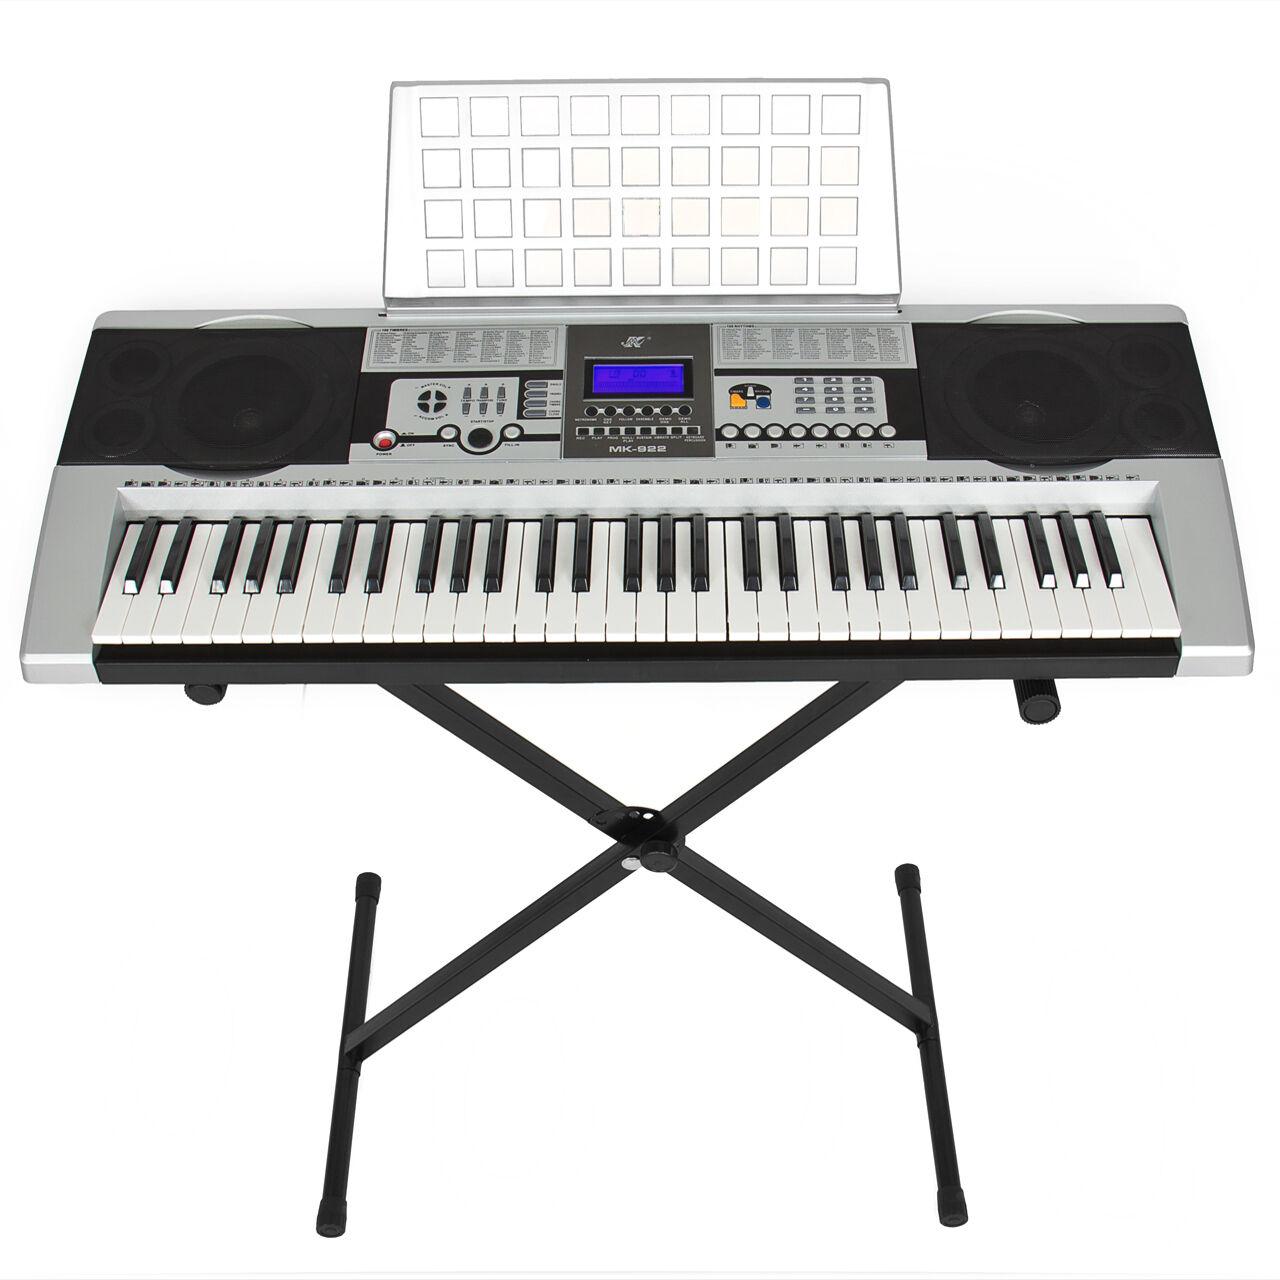 Electronic Piano Keyboard 61 Key Music Key Board Piano With X Stand Heavy Duty